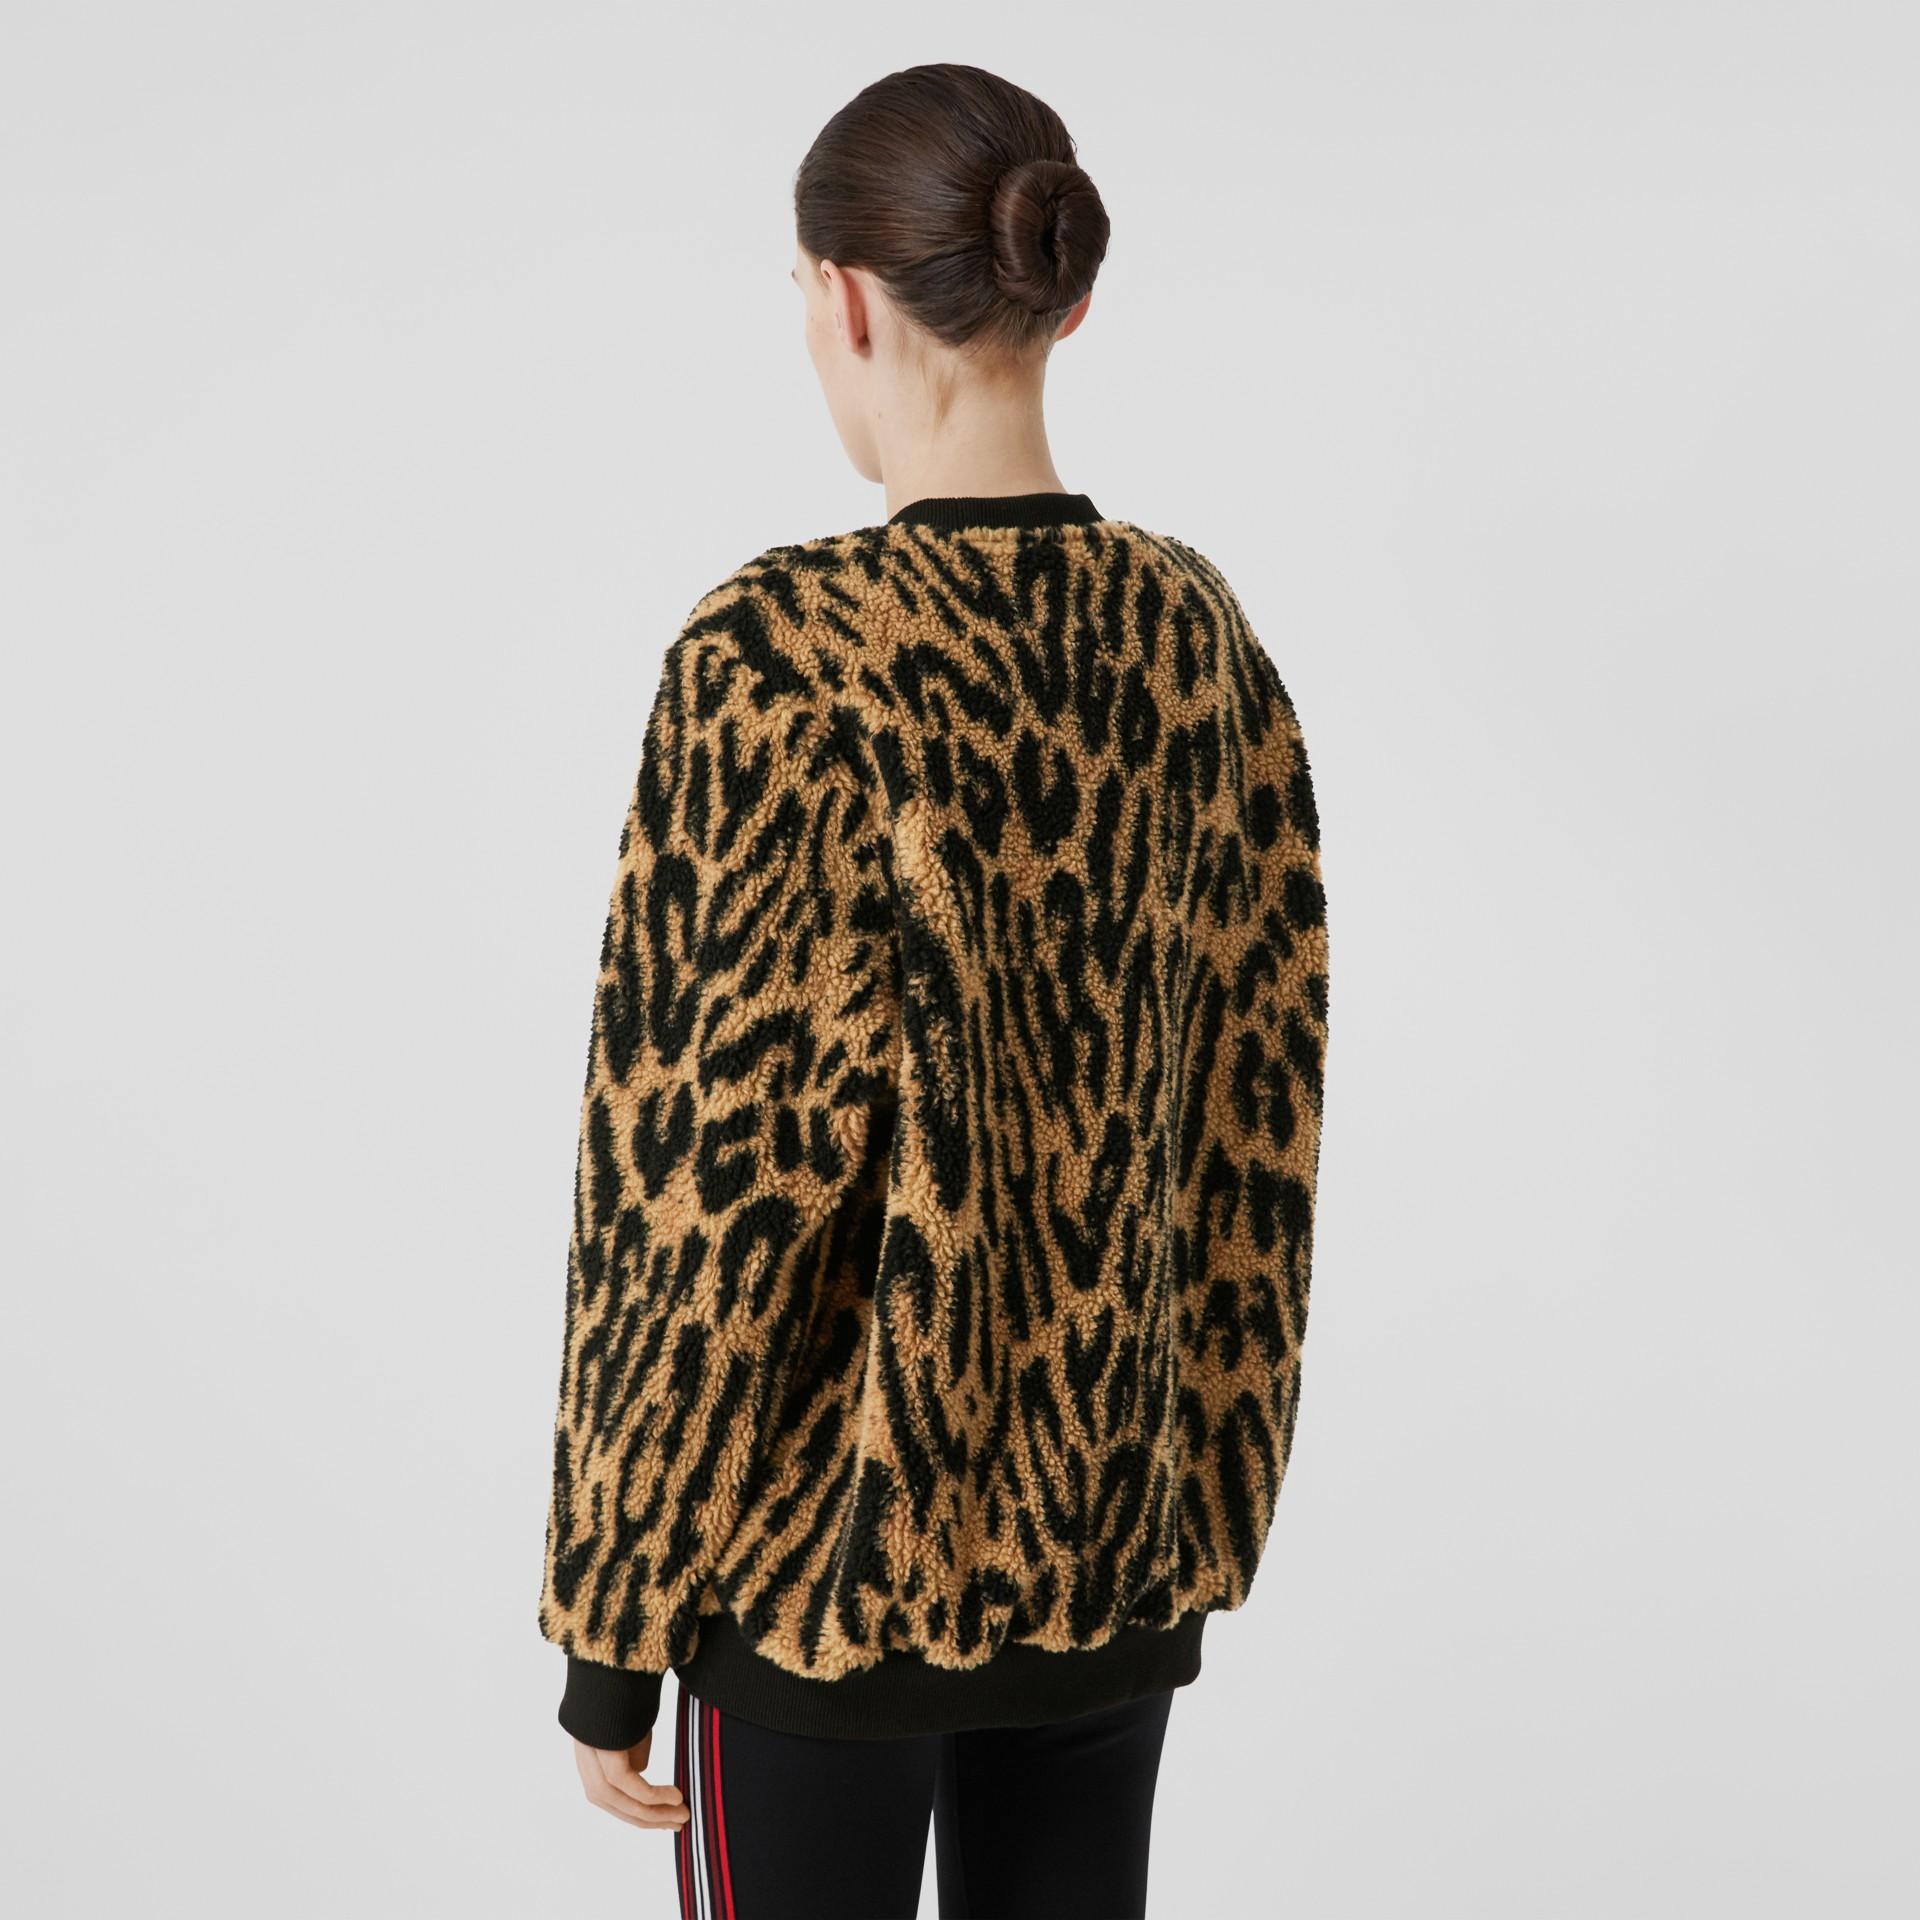 Logo Graphic Leopard Fleece Jacquard Sweatshirt in Dark Mustard - Women | Burberry - gallery image 2